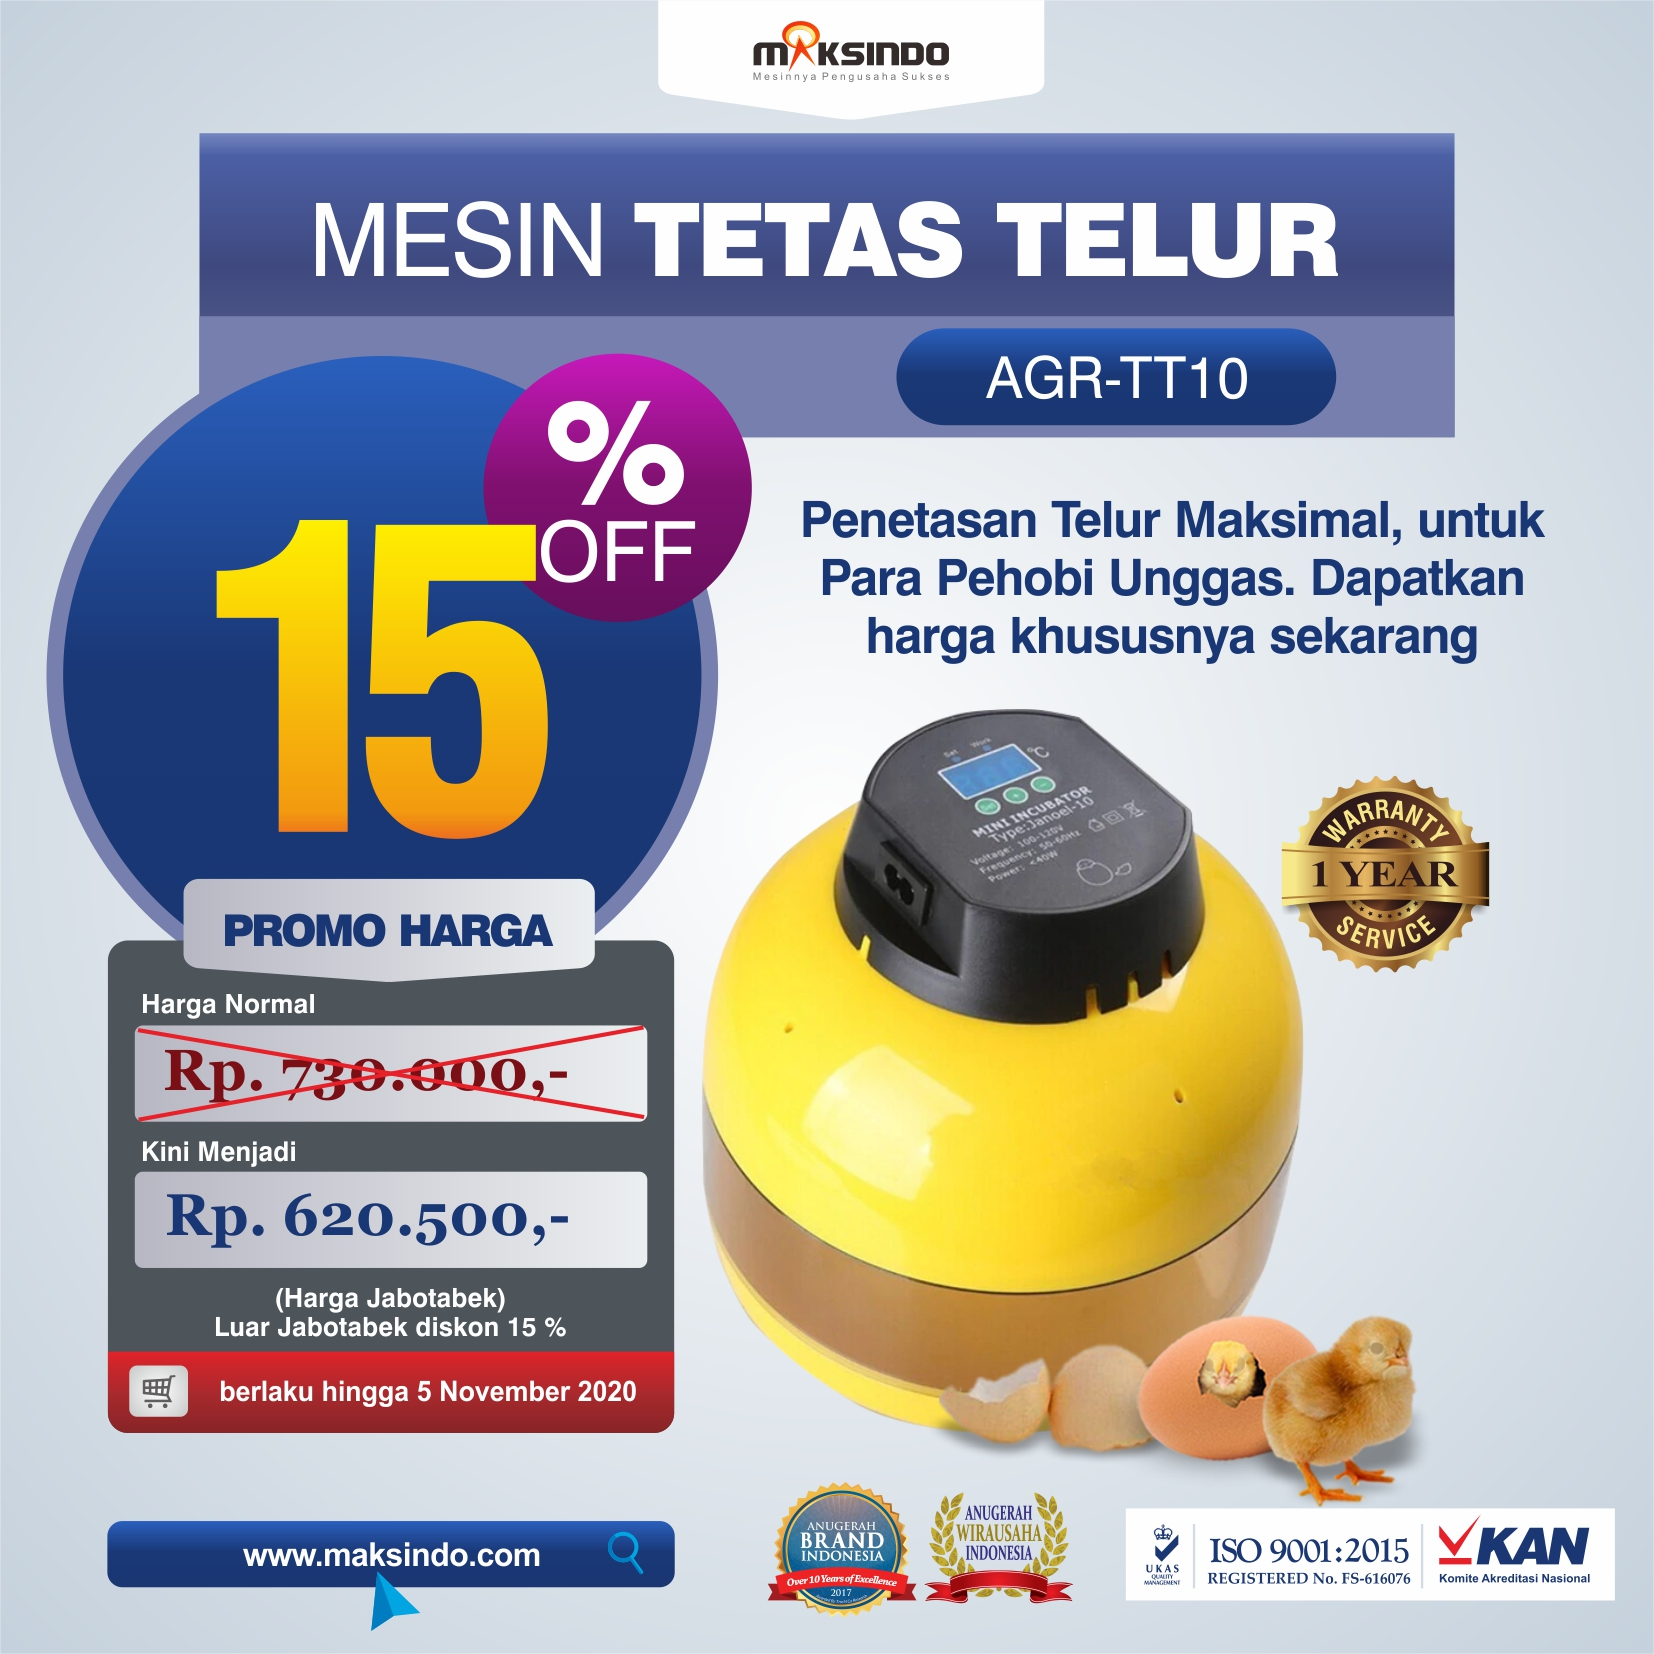 Jual Mesin Tetas Telur 10 Butir (AGR-TT-10) di Mataram